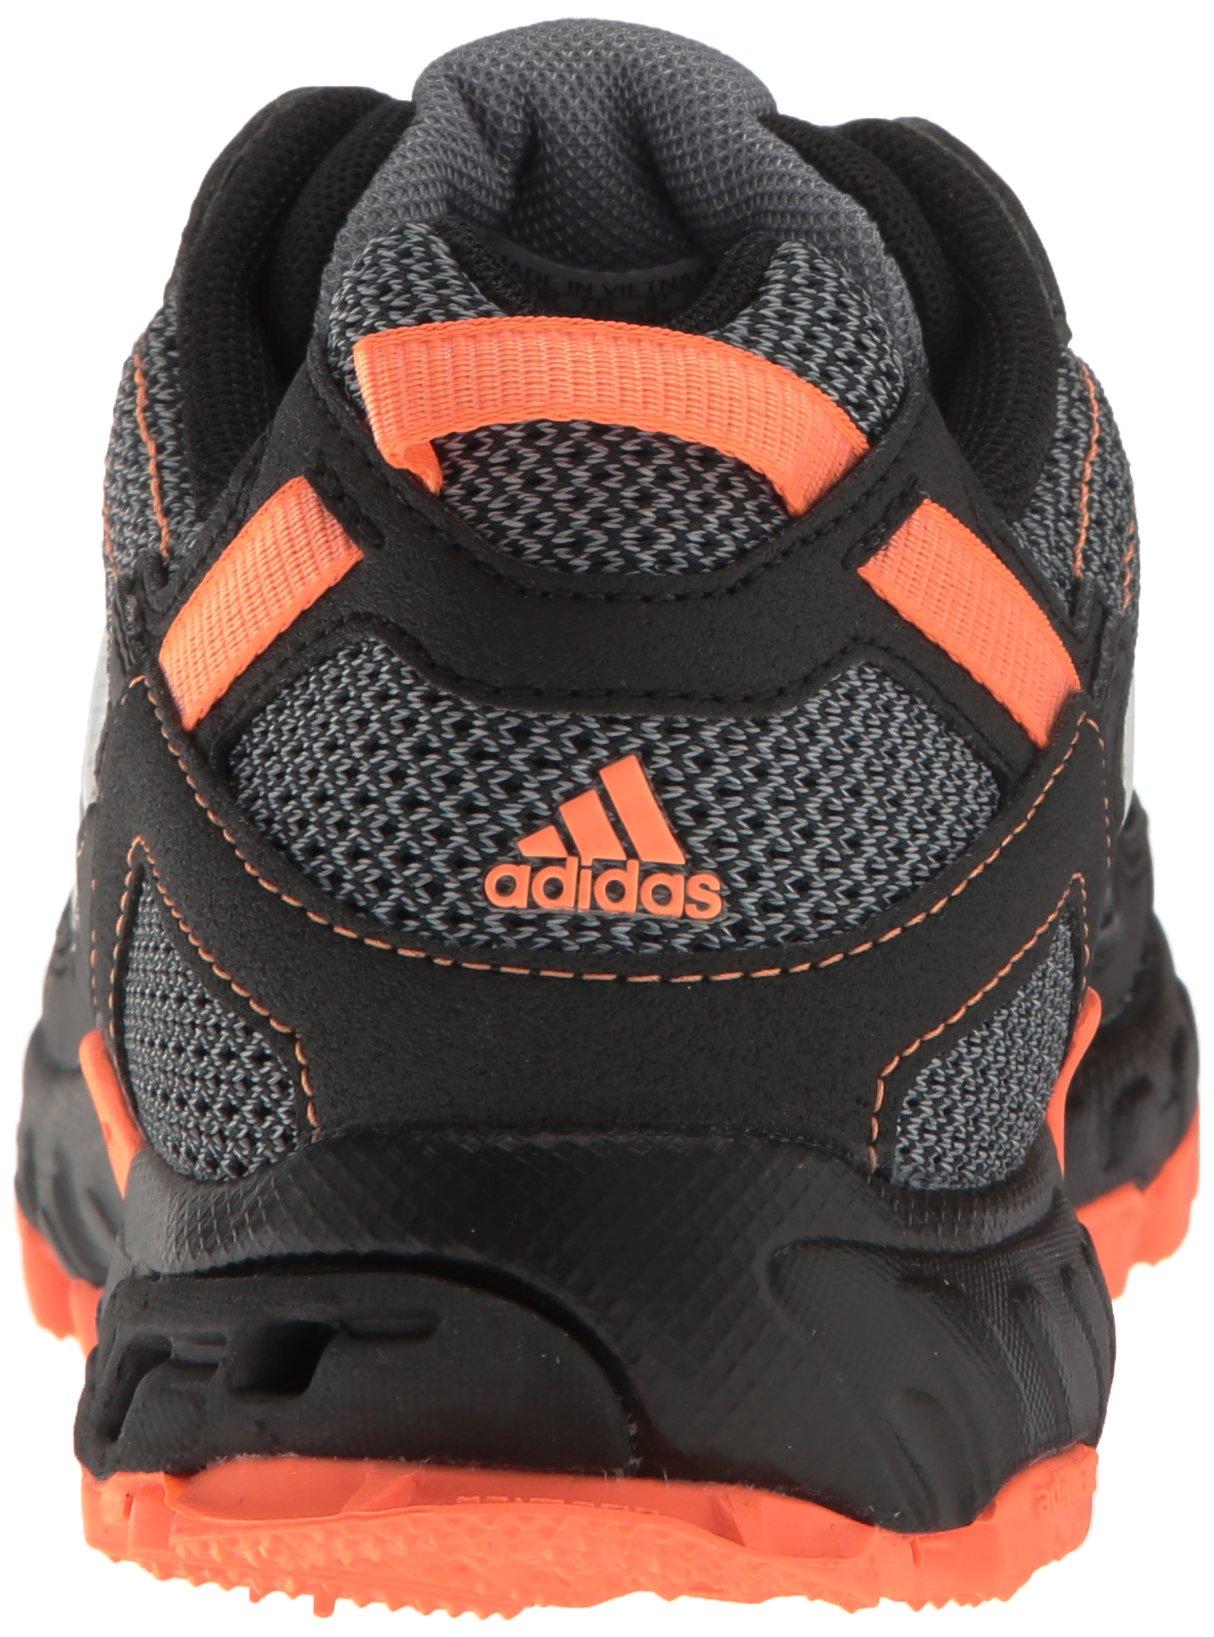 adidas Women's Rockadia Trail W Running Shoe Black/White/Easy Orange 6 M US by adidas (Image #2)